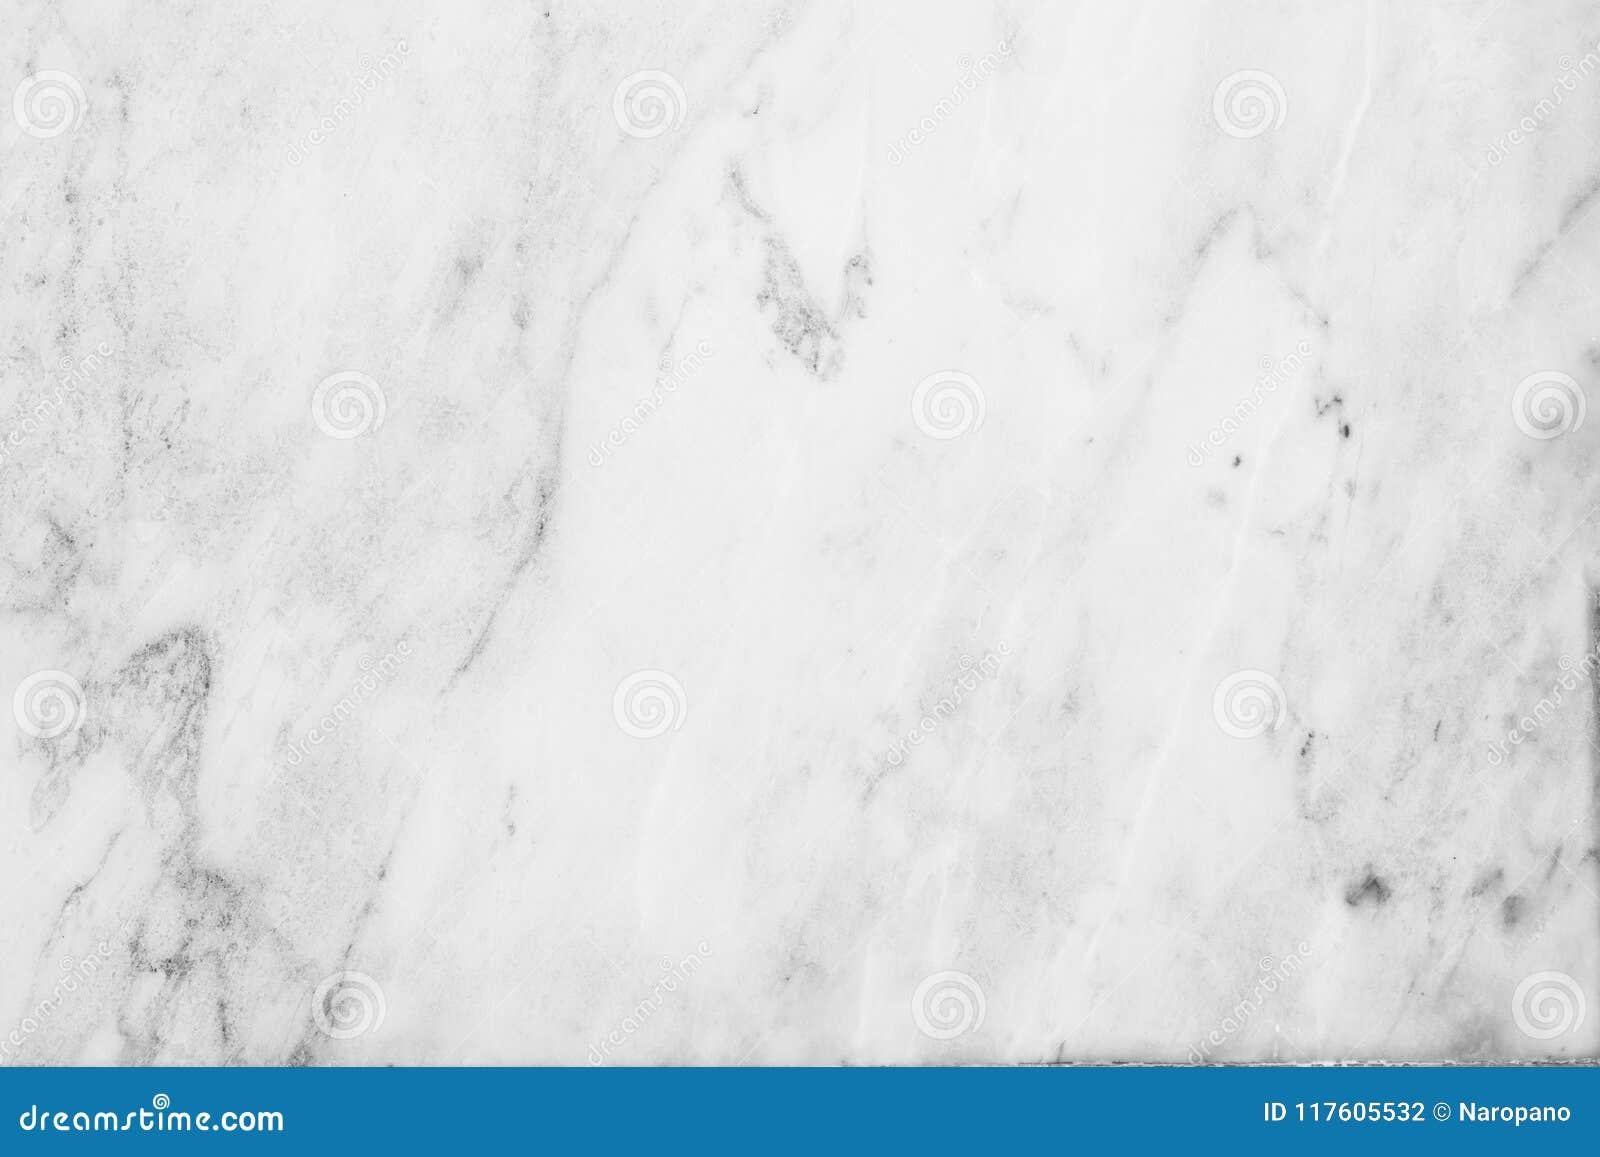 White marble texture floor background